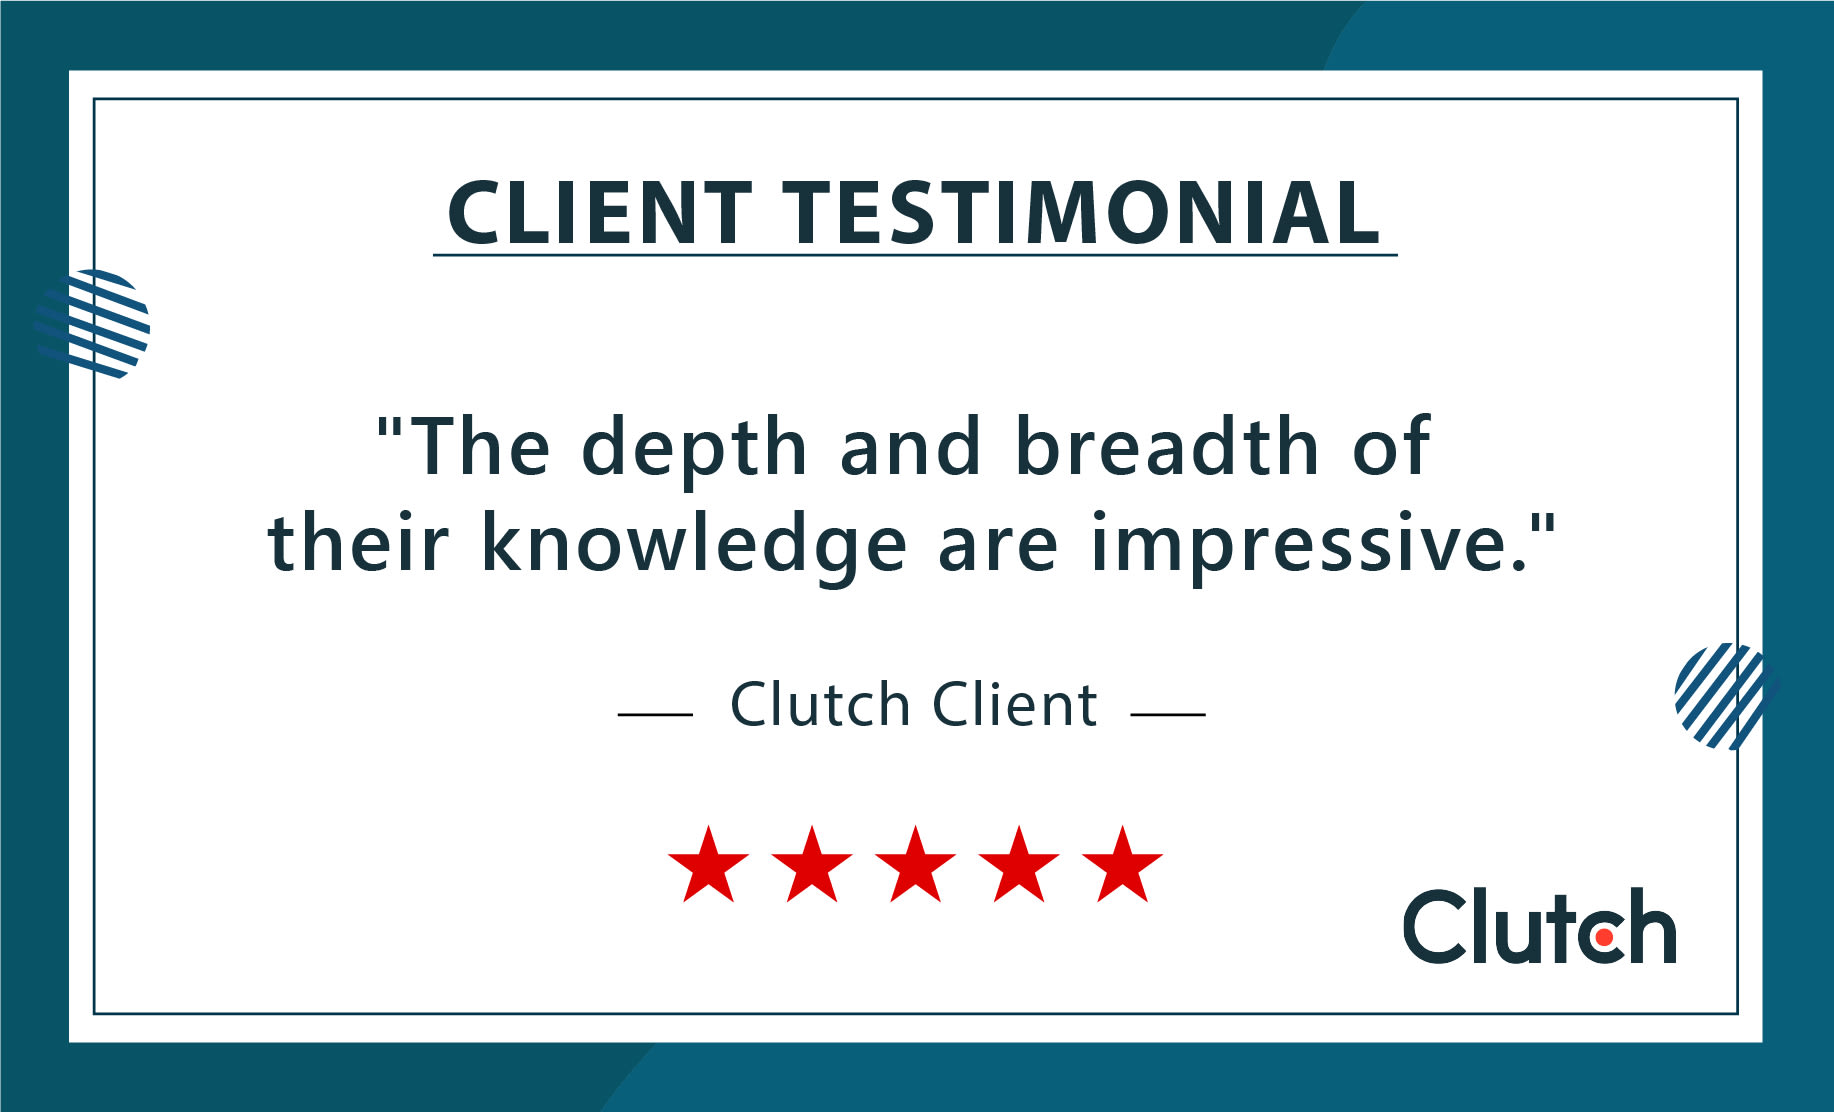 SIPL Client Testimonial